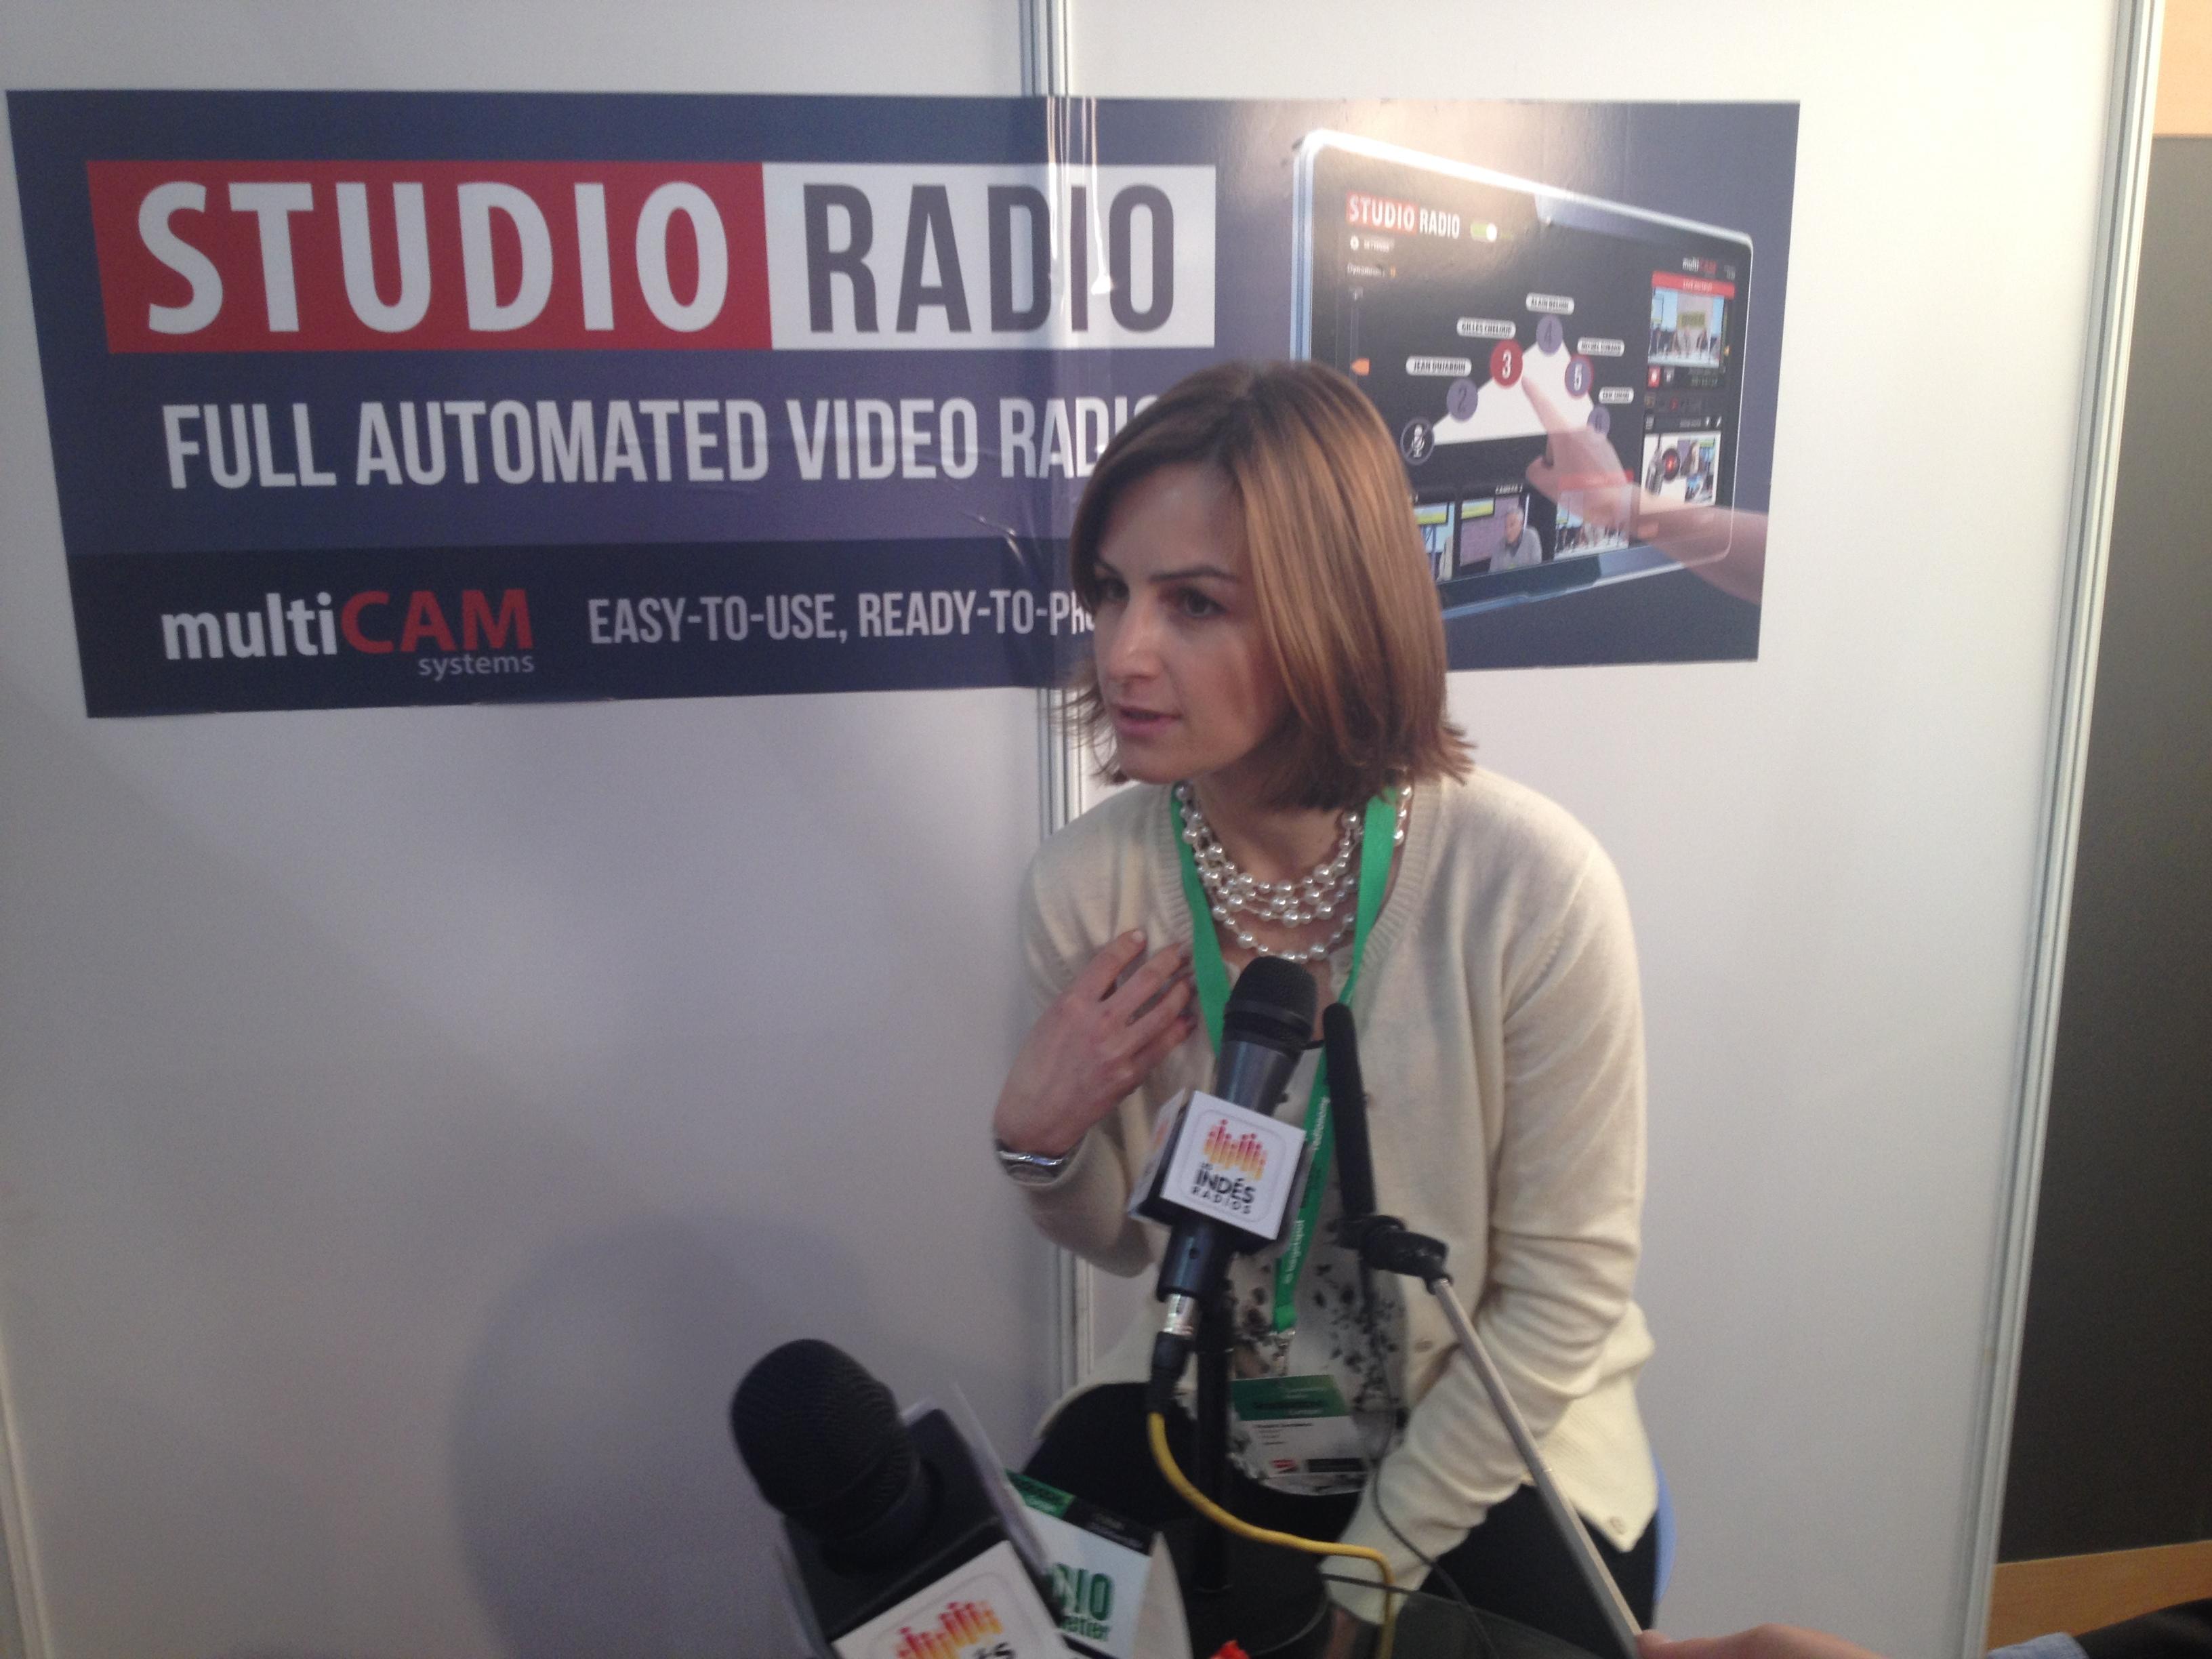 La consultante et universitaire portugaise Paula Cordeiro qui rejoindra prochainement l'équipe de La Lettre Pro de la Radio